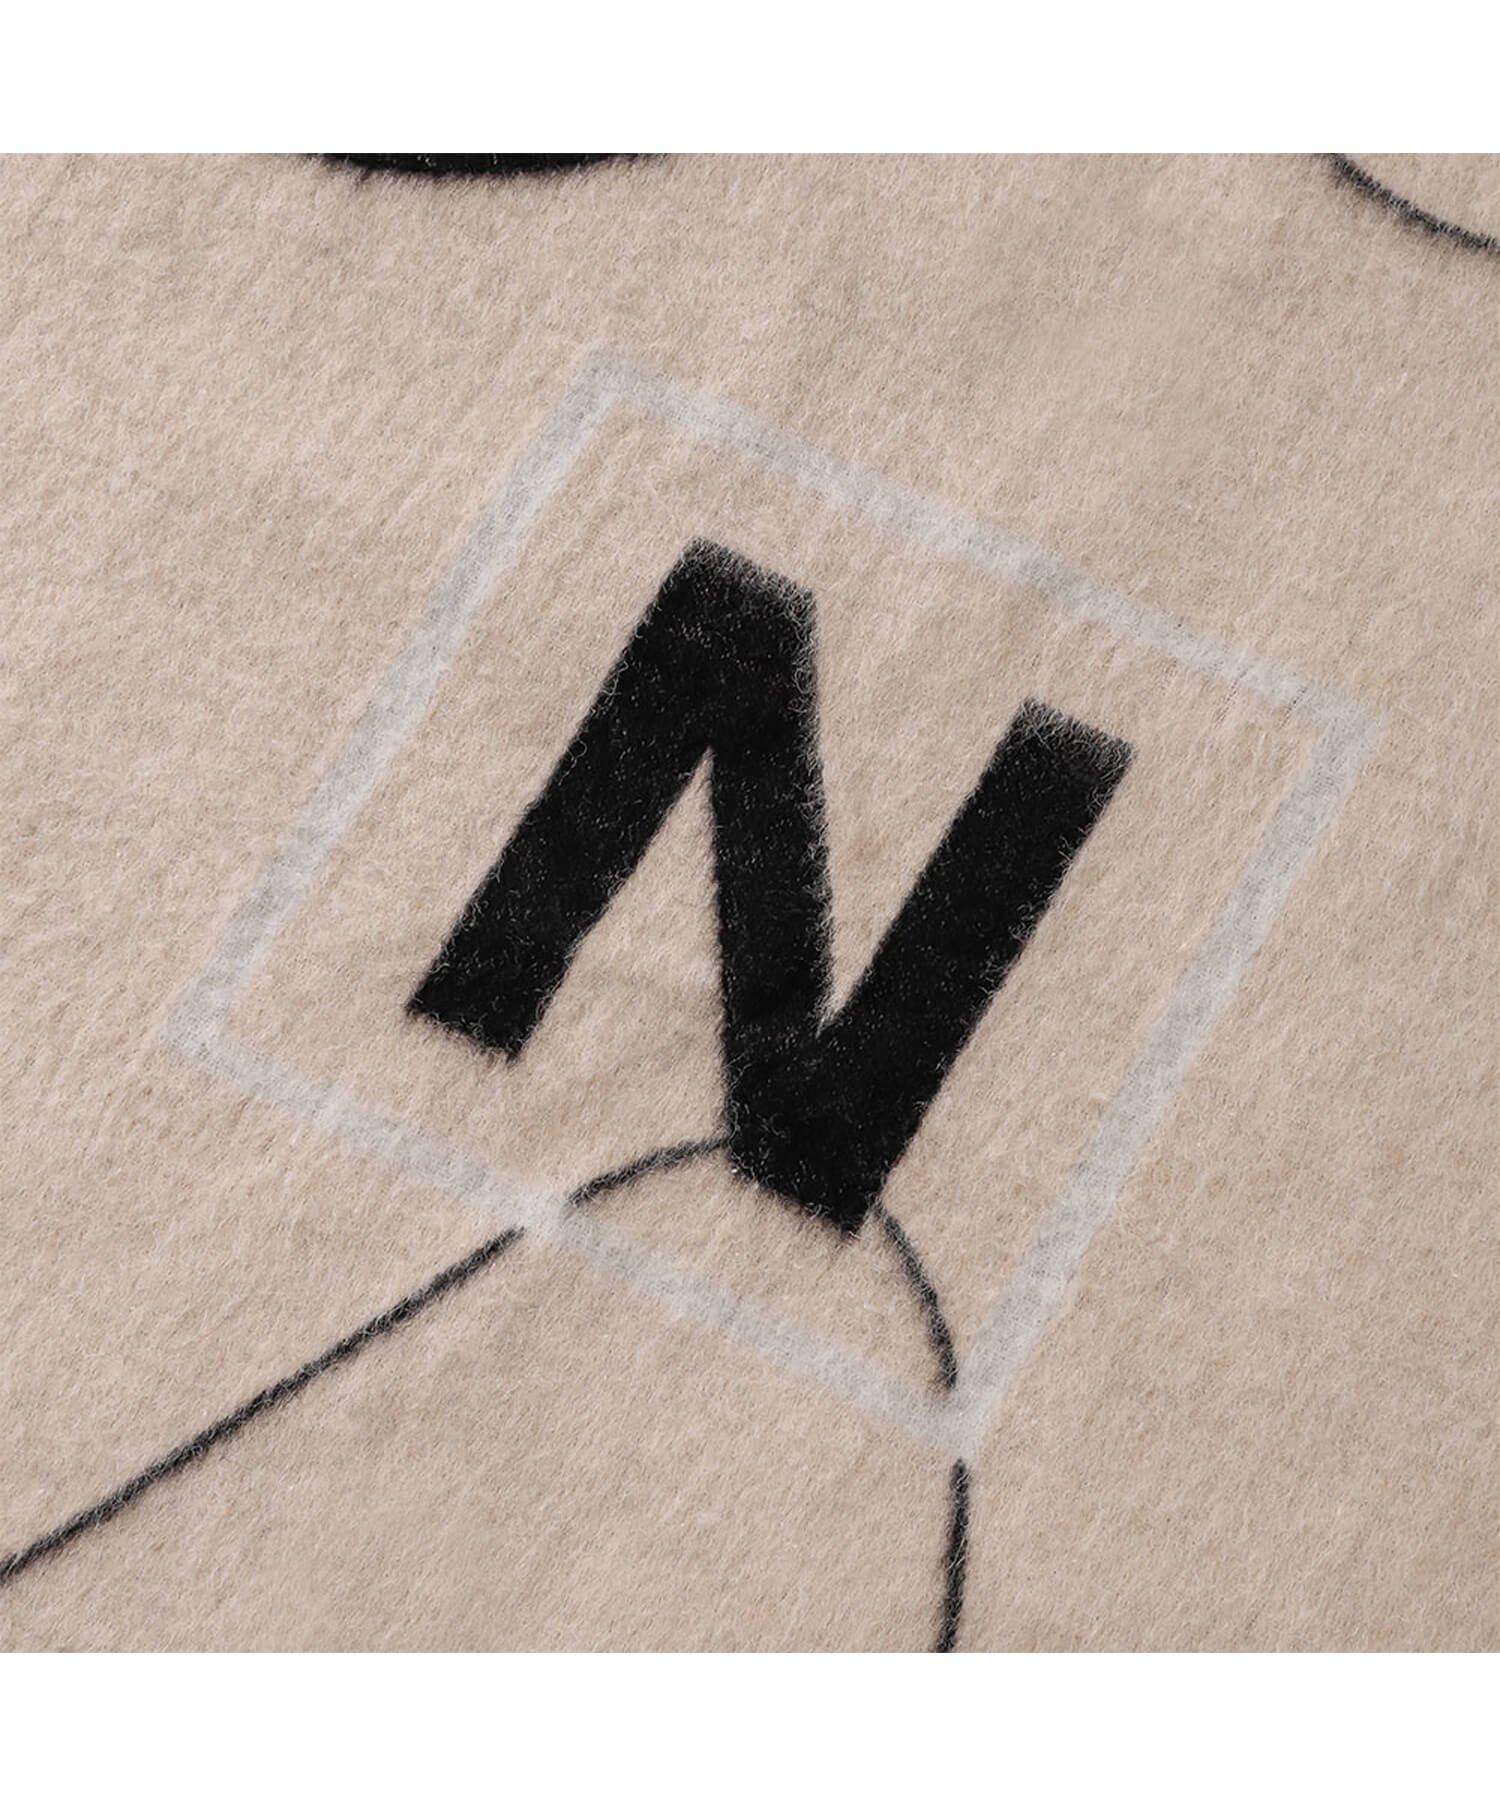 NIL DUE / NIL UN TOKYO / ニル デュエ / ニル アン トーキョー | NDNU ABSTRACT ART BLANKET (BEIGE) 商品画像1